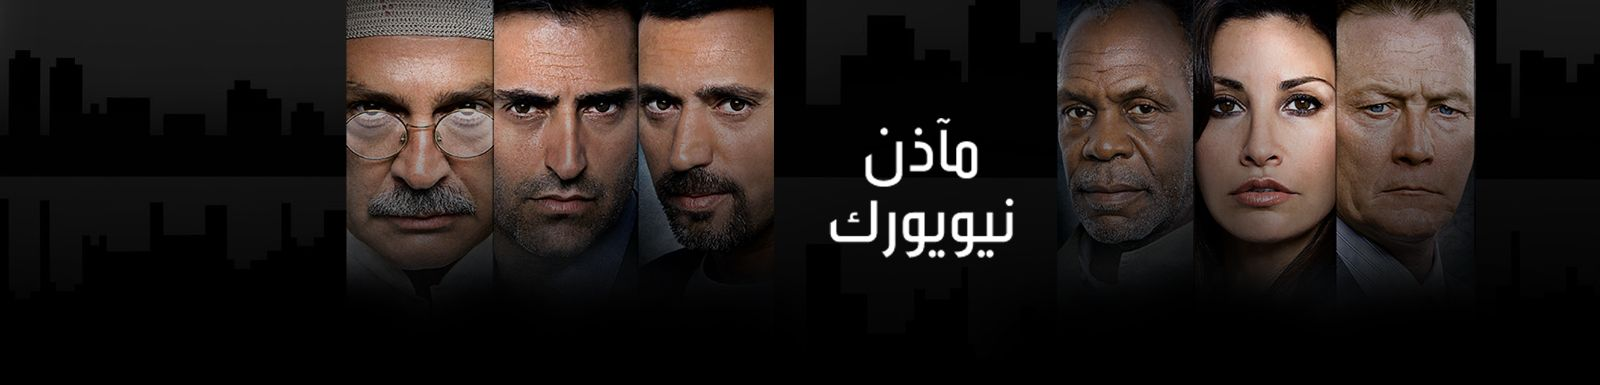 ����� ����� ���� ������� ������ 1 MBC shahid ���� ��